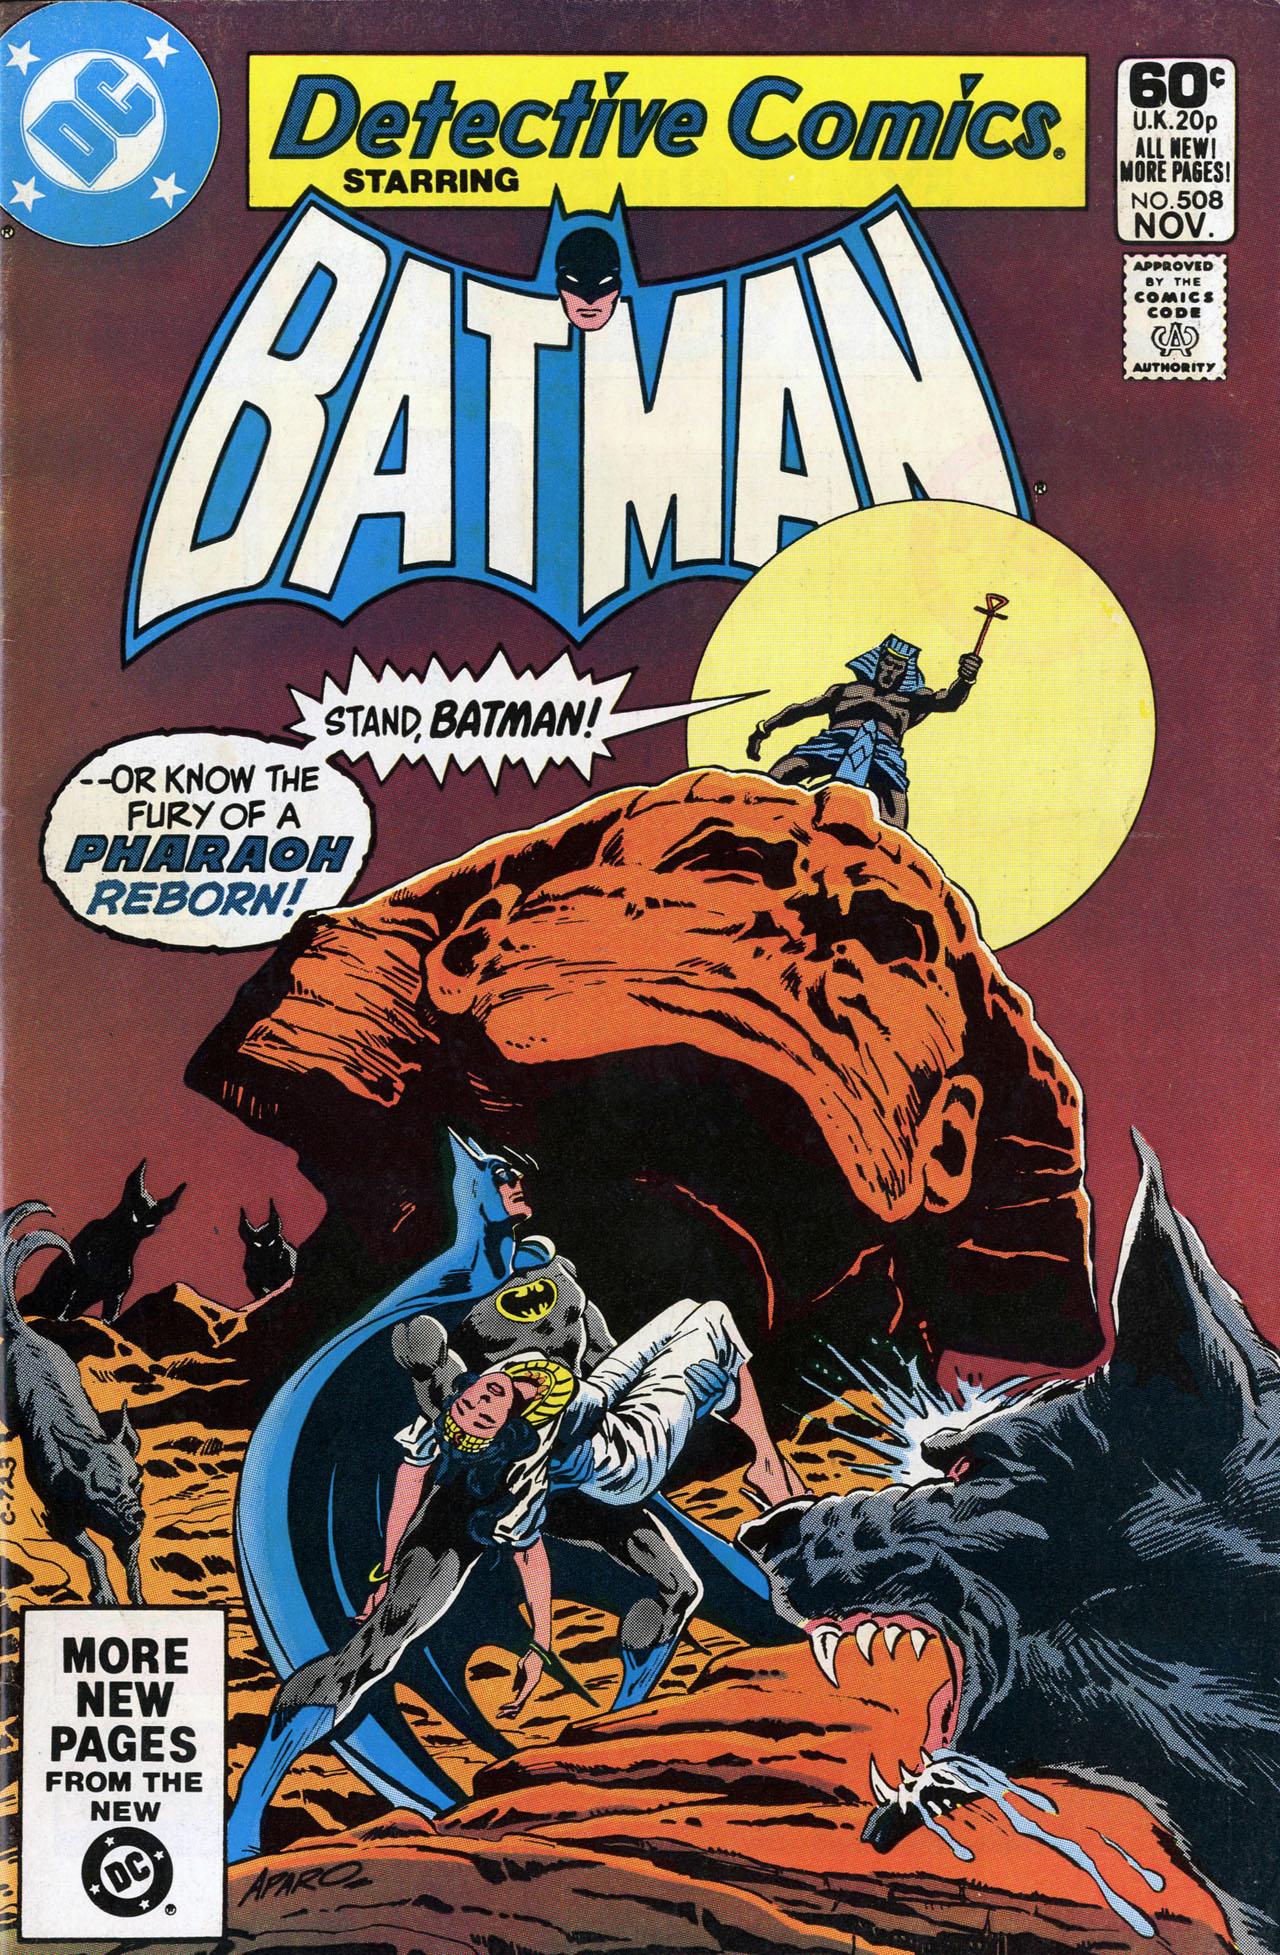 Detective Comics (1937) 508 Page 1